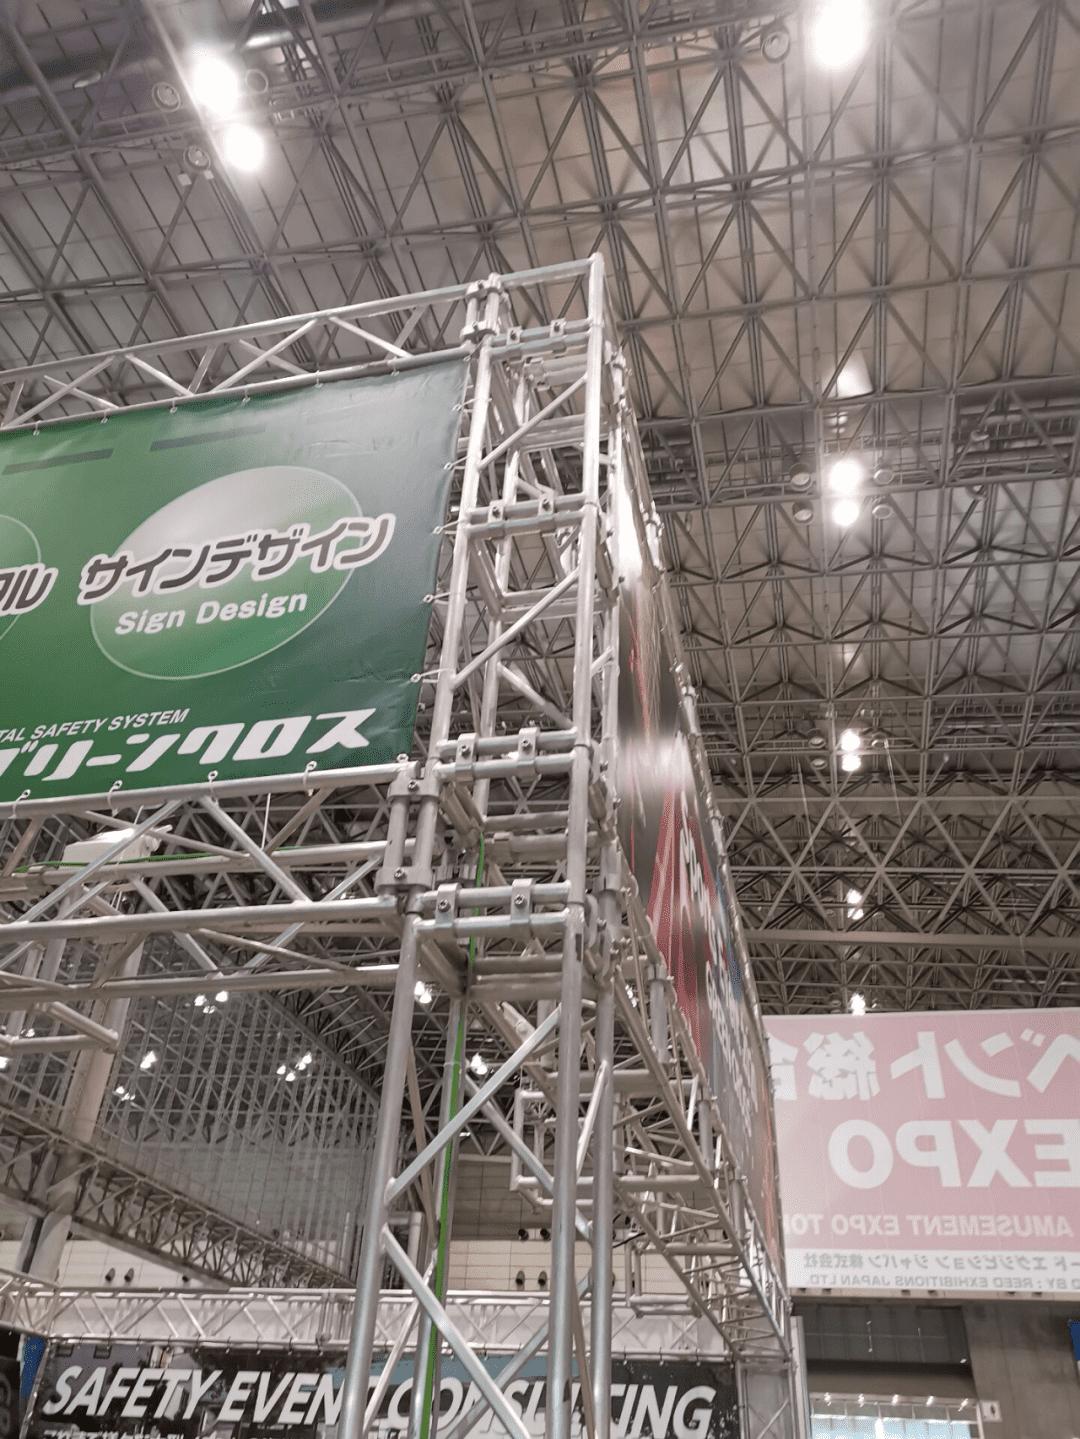 Japan exhibition installation site